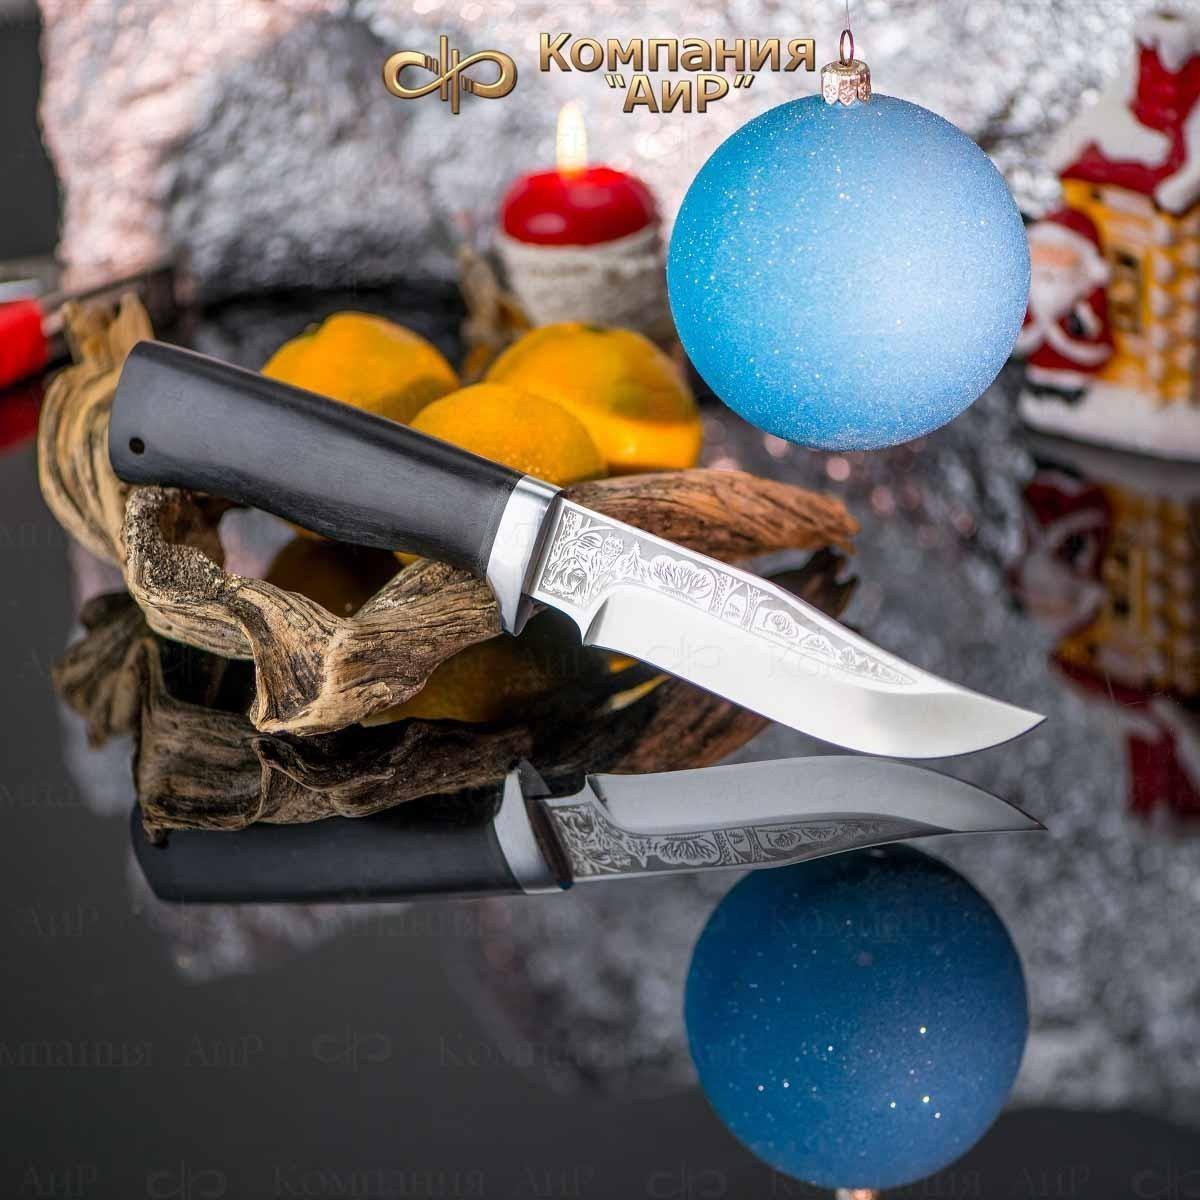 Нож АиР Клычок-1, сталь 100х13м, рукоять граб